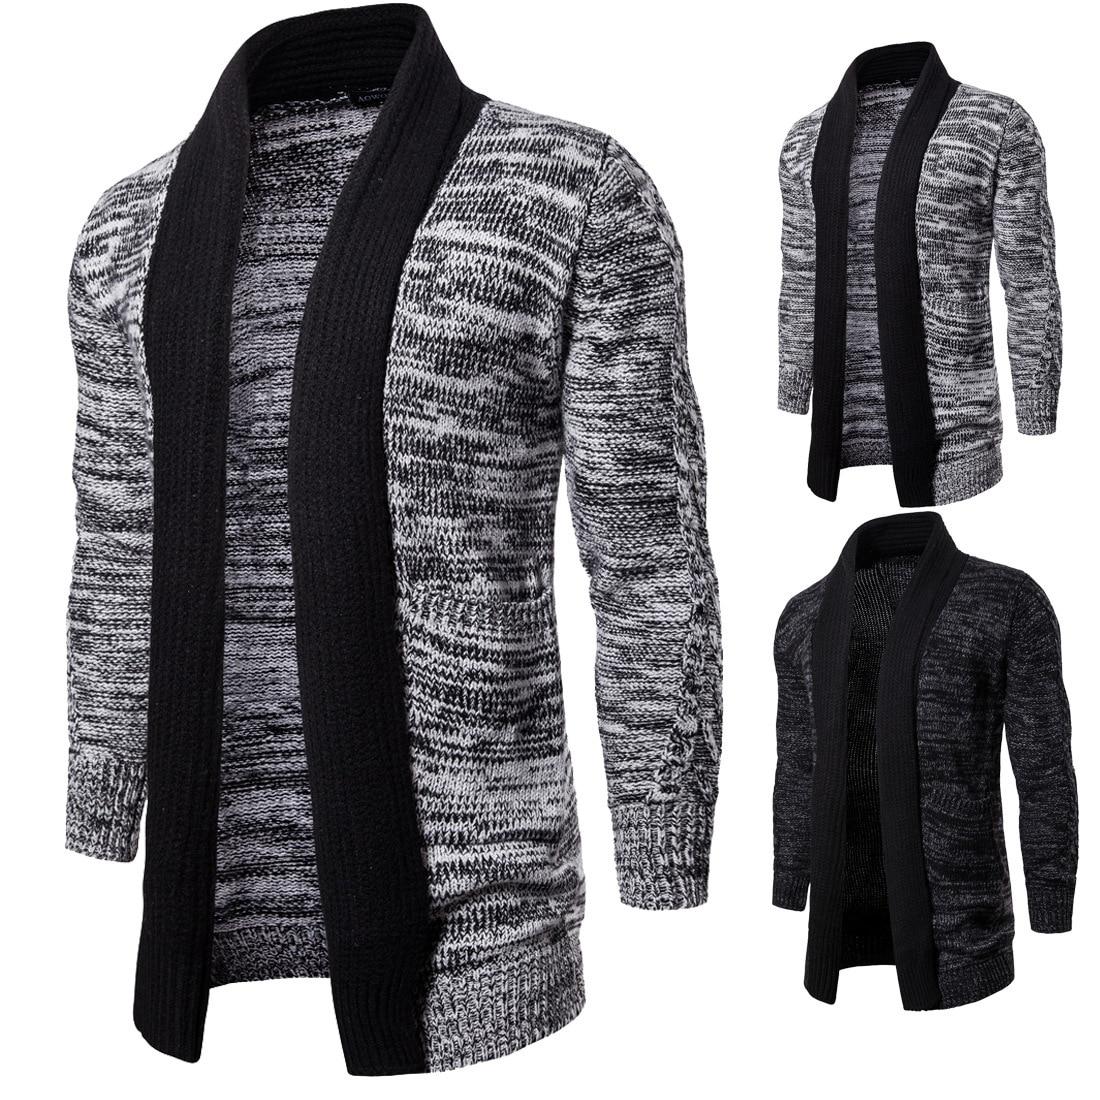 Men's Sweater, Autumn And Winter Clothing,Men's Blouse,Sweater Men,Warm Winter Clothes Men's Clothing.Knit Cardigan,Men